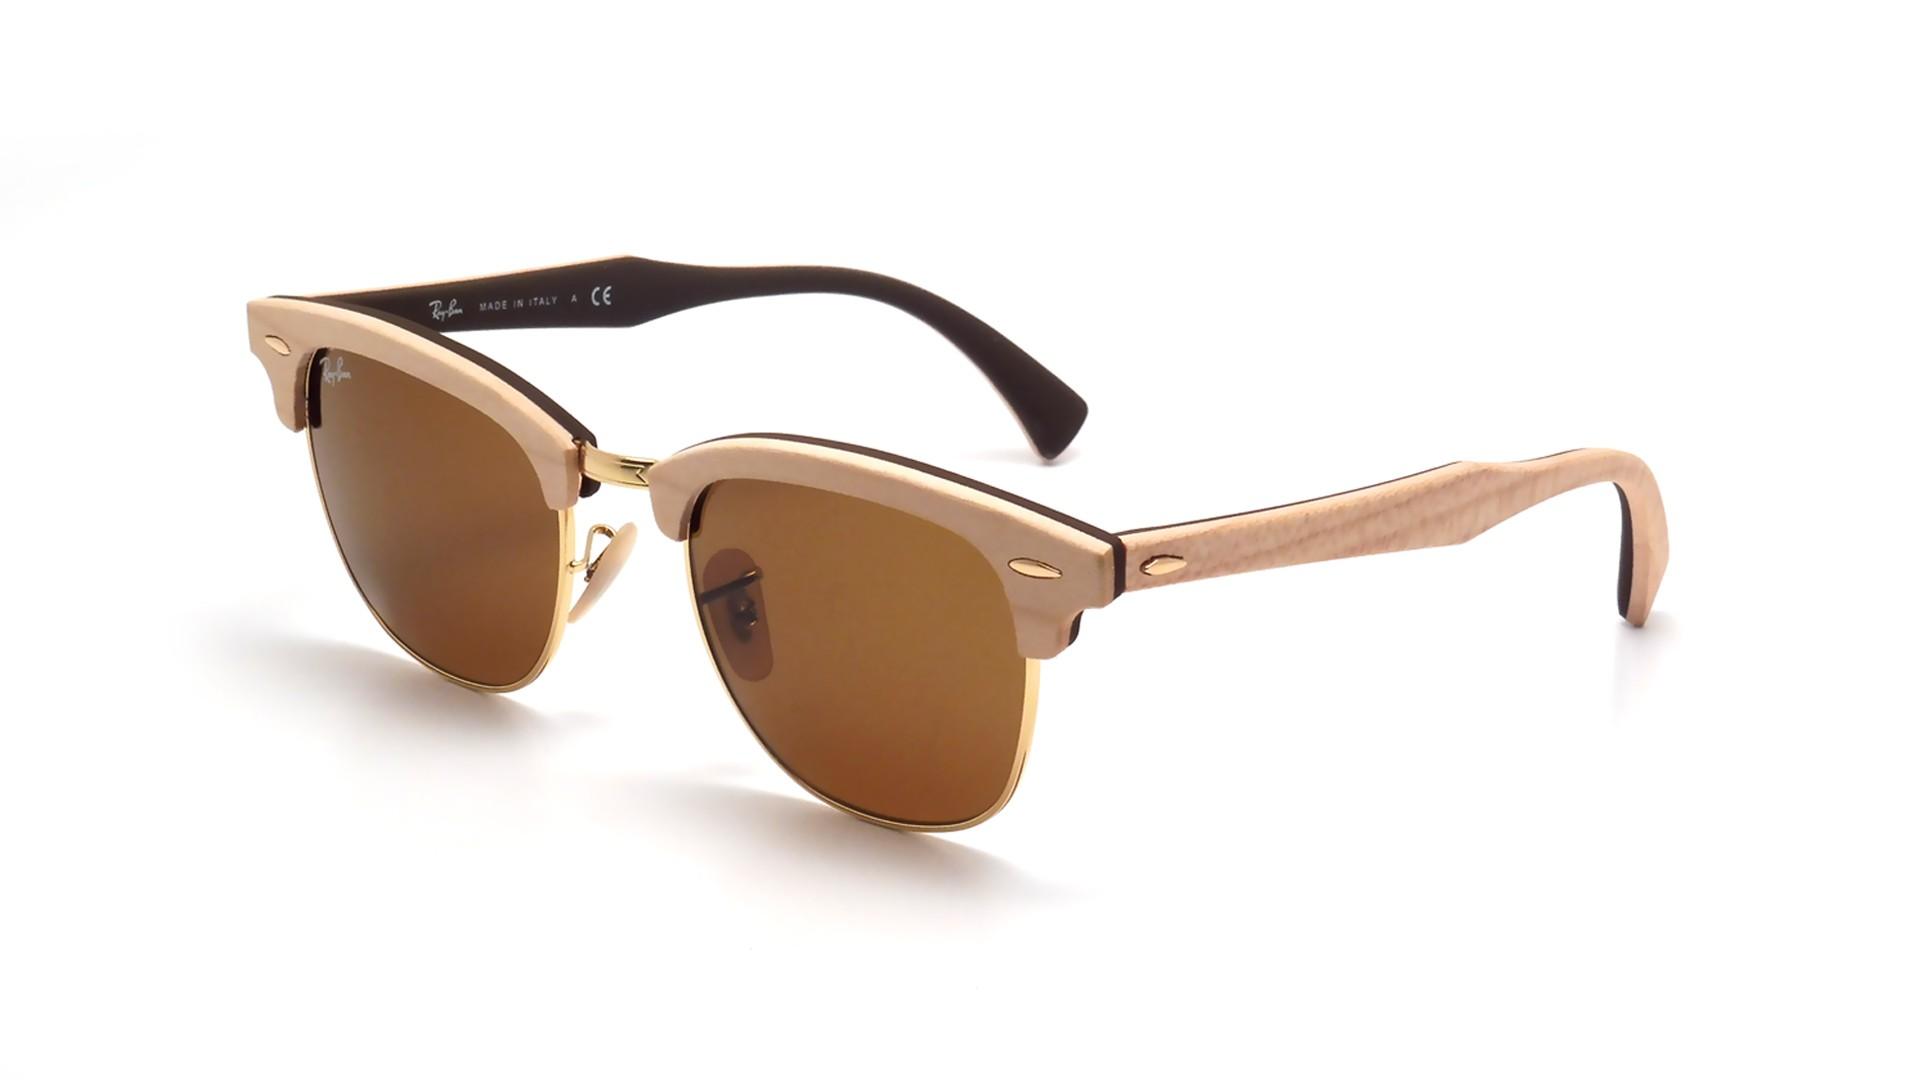 4c1e417e5e Sunglasses Ray-Ban Clubmaster Wood Brown RB3016M 1179 51-21 Medium